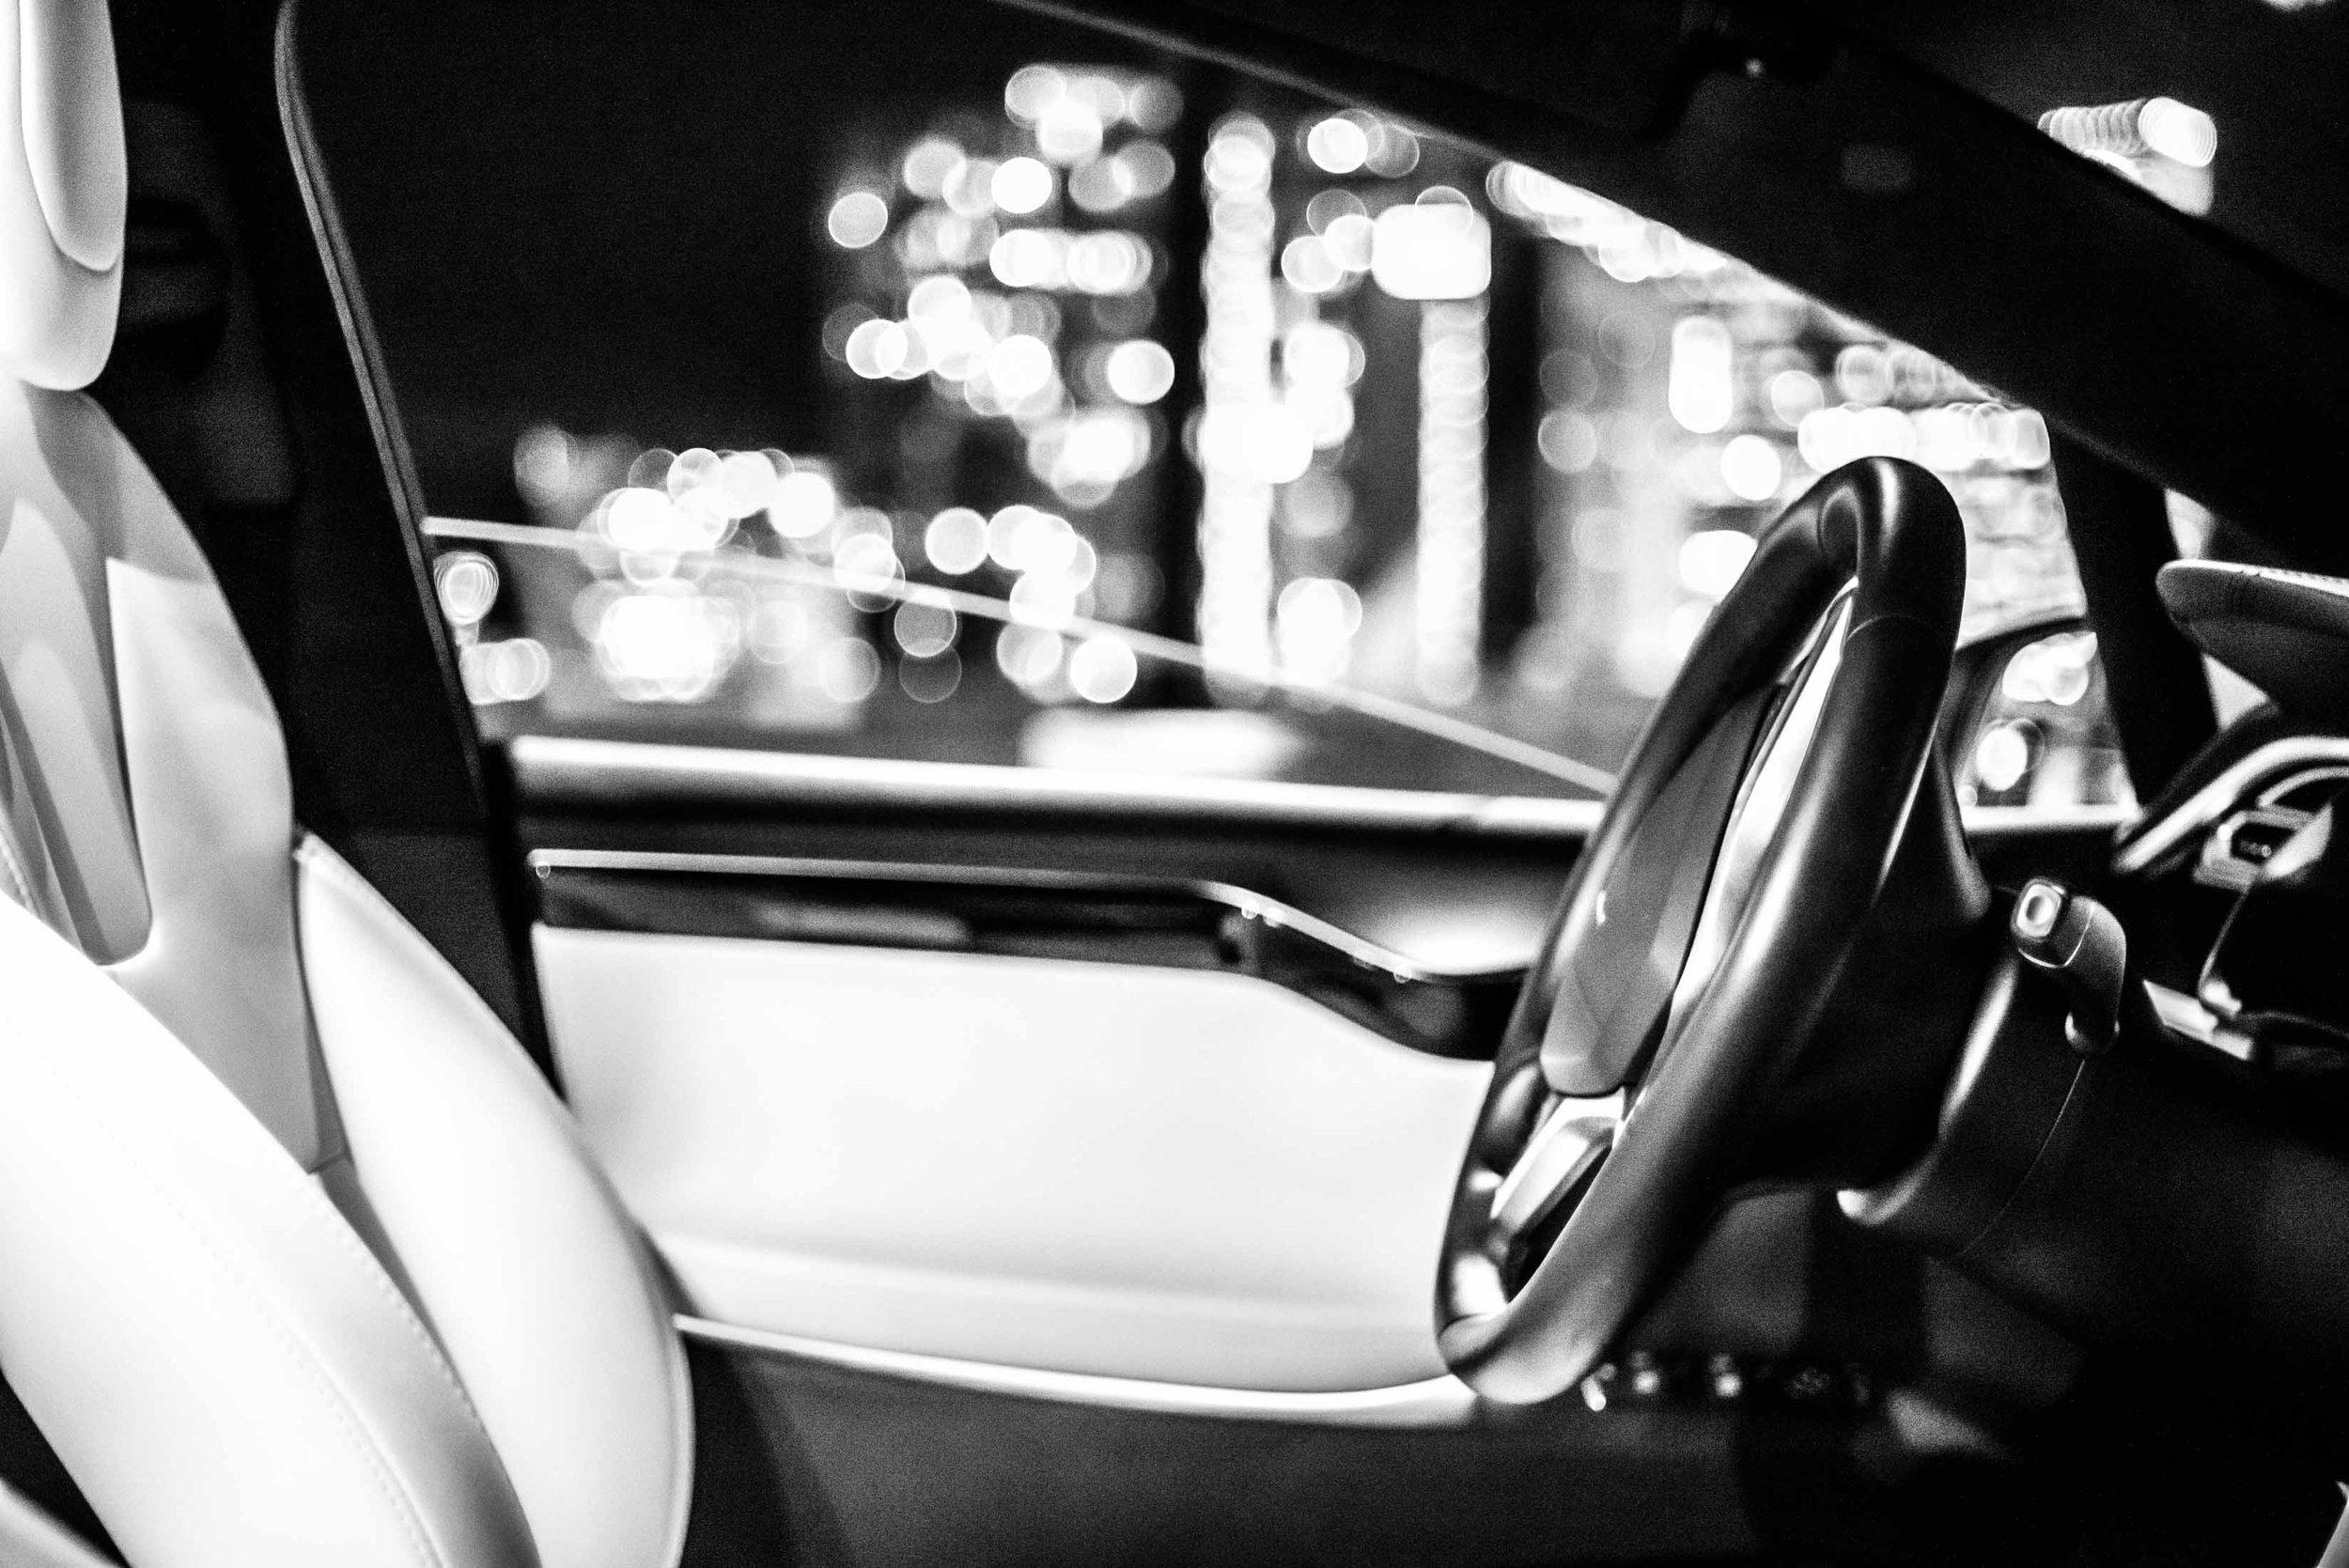 fleet+vehicle+sexy+car+photo+video+speed+tesla+p100d+vadym+guliuk+photography-14.jpg